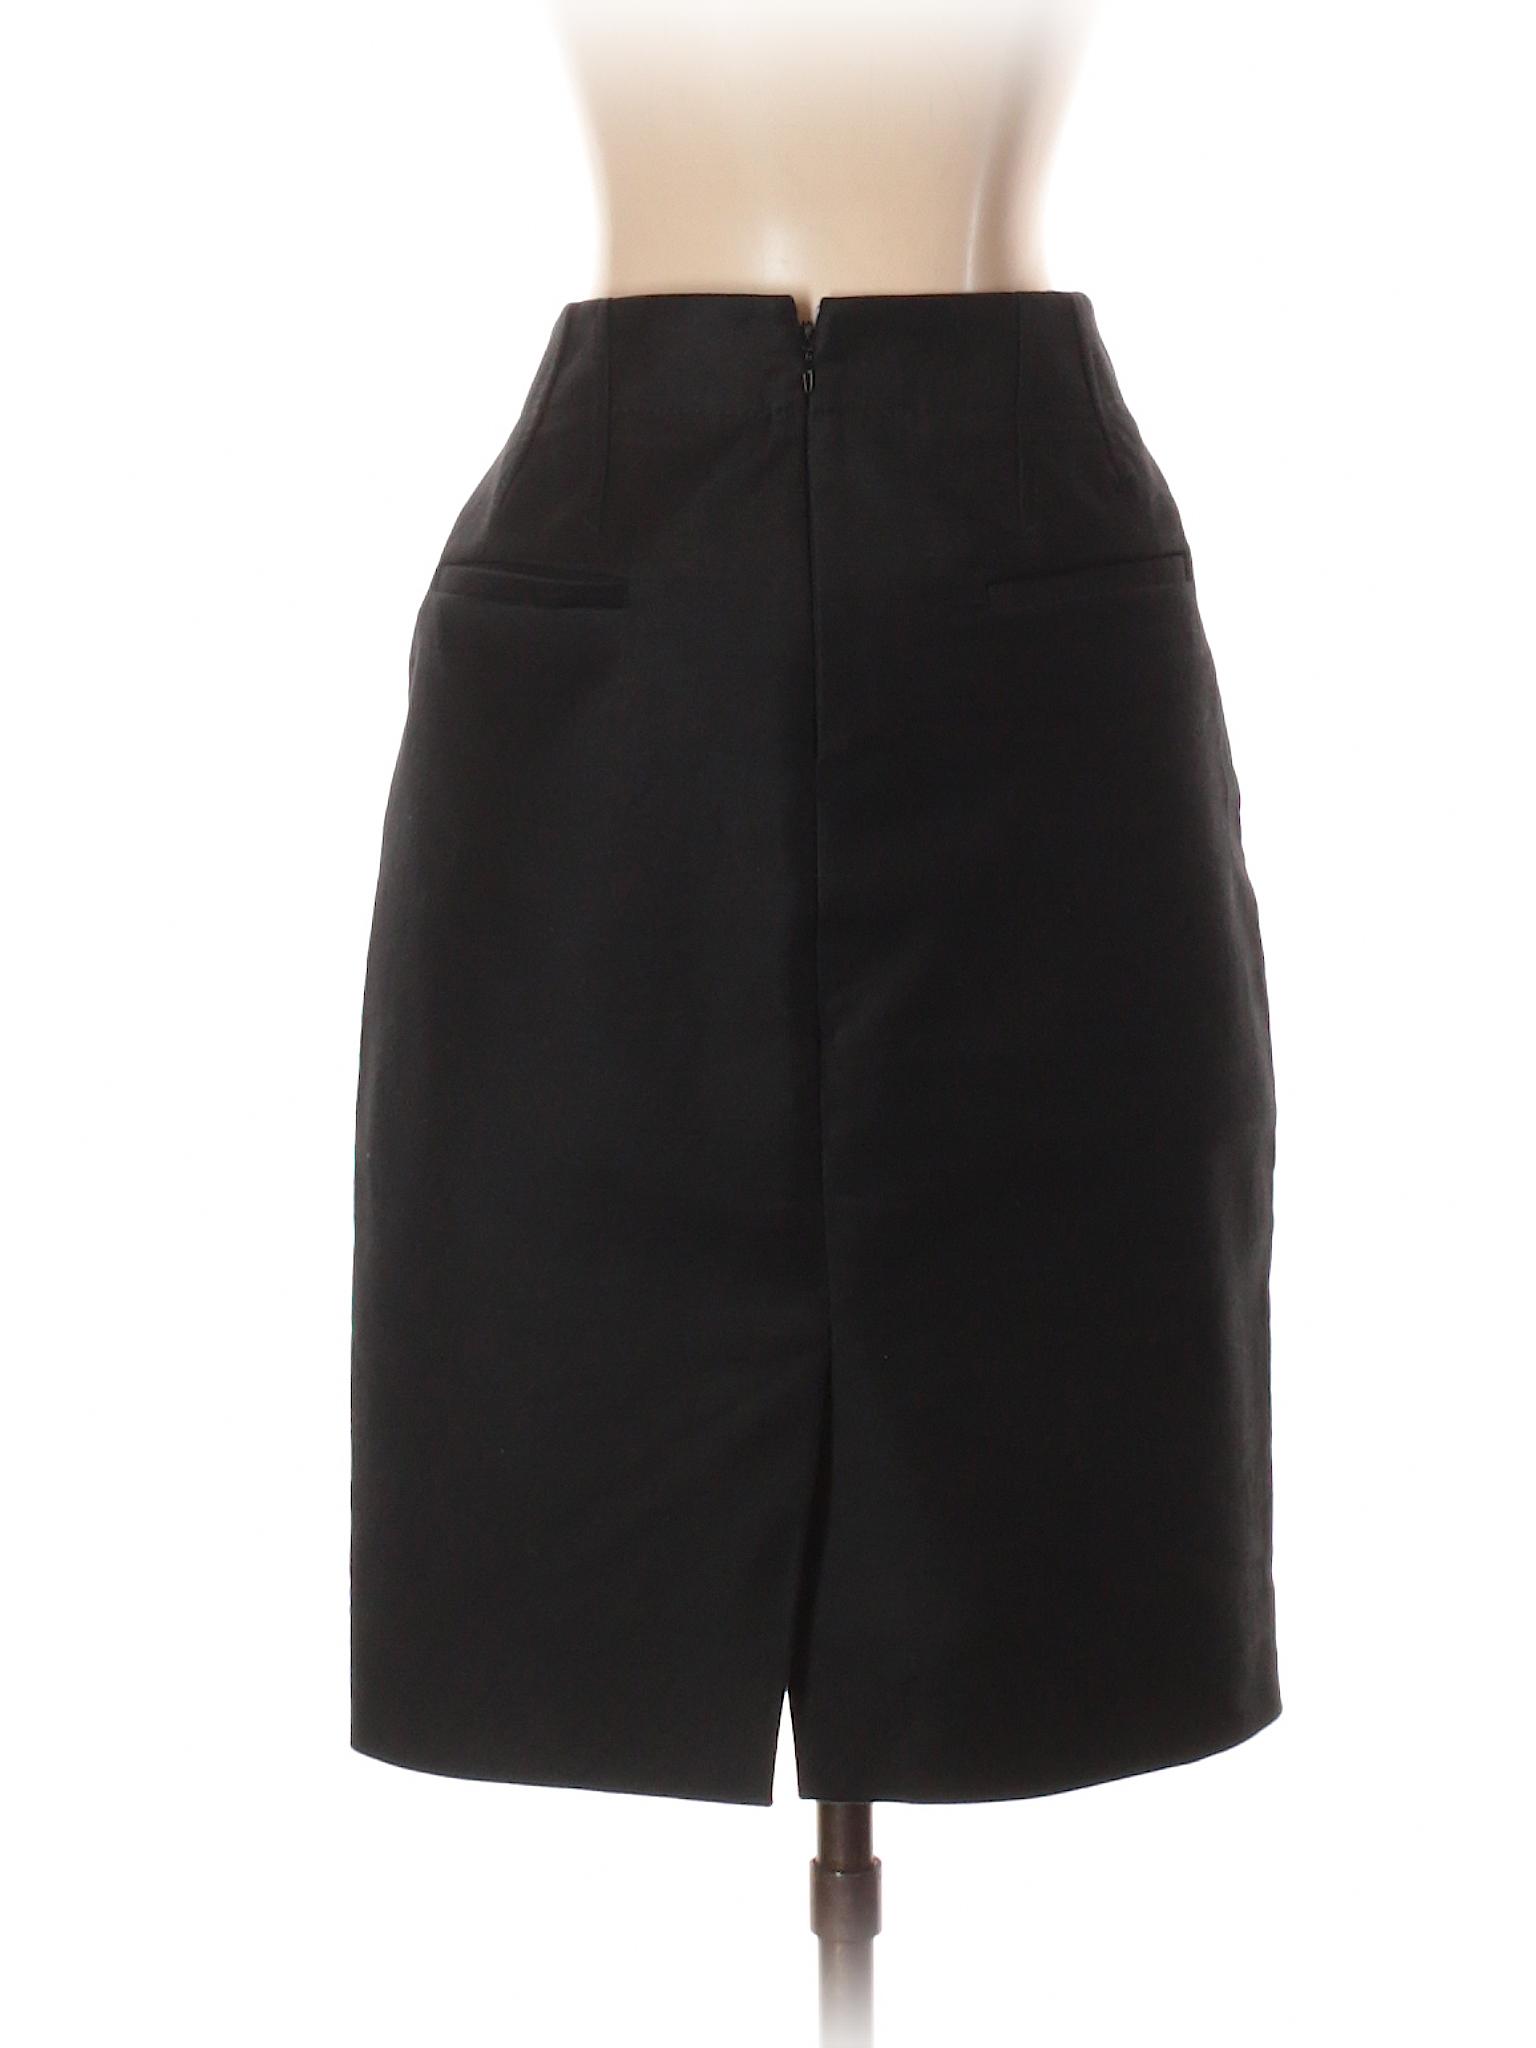 Casual Casual Boutique Skirt Skirt Boutique Skirt Boutique Boutique Skirt Casual Casual wgqWpZBff